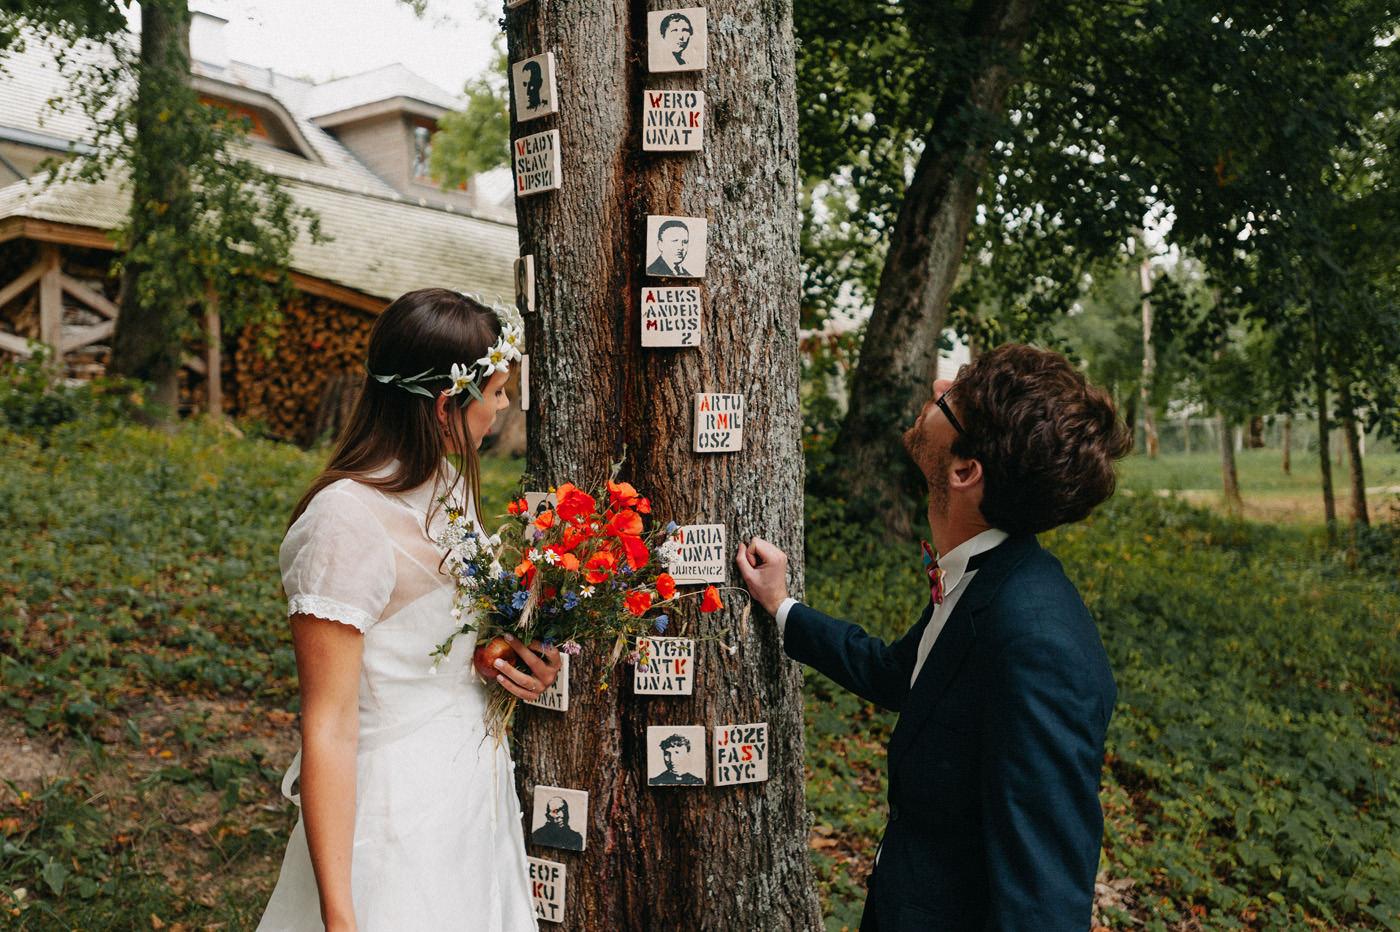 naturalna sesja po ślubie